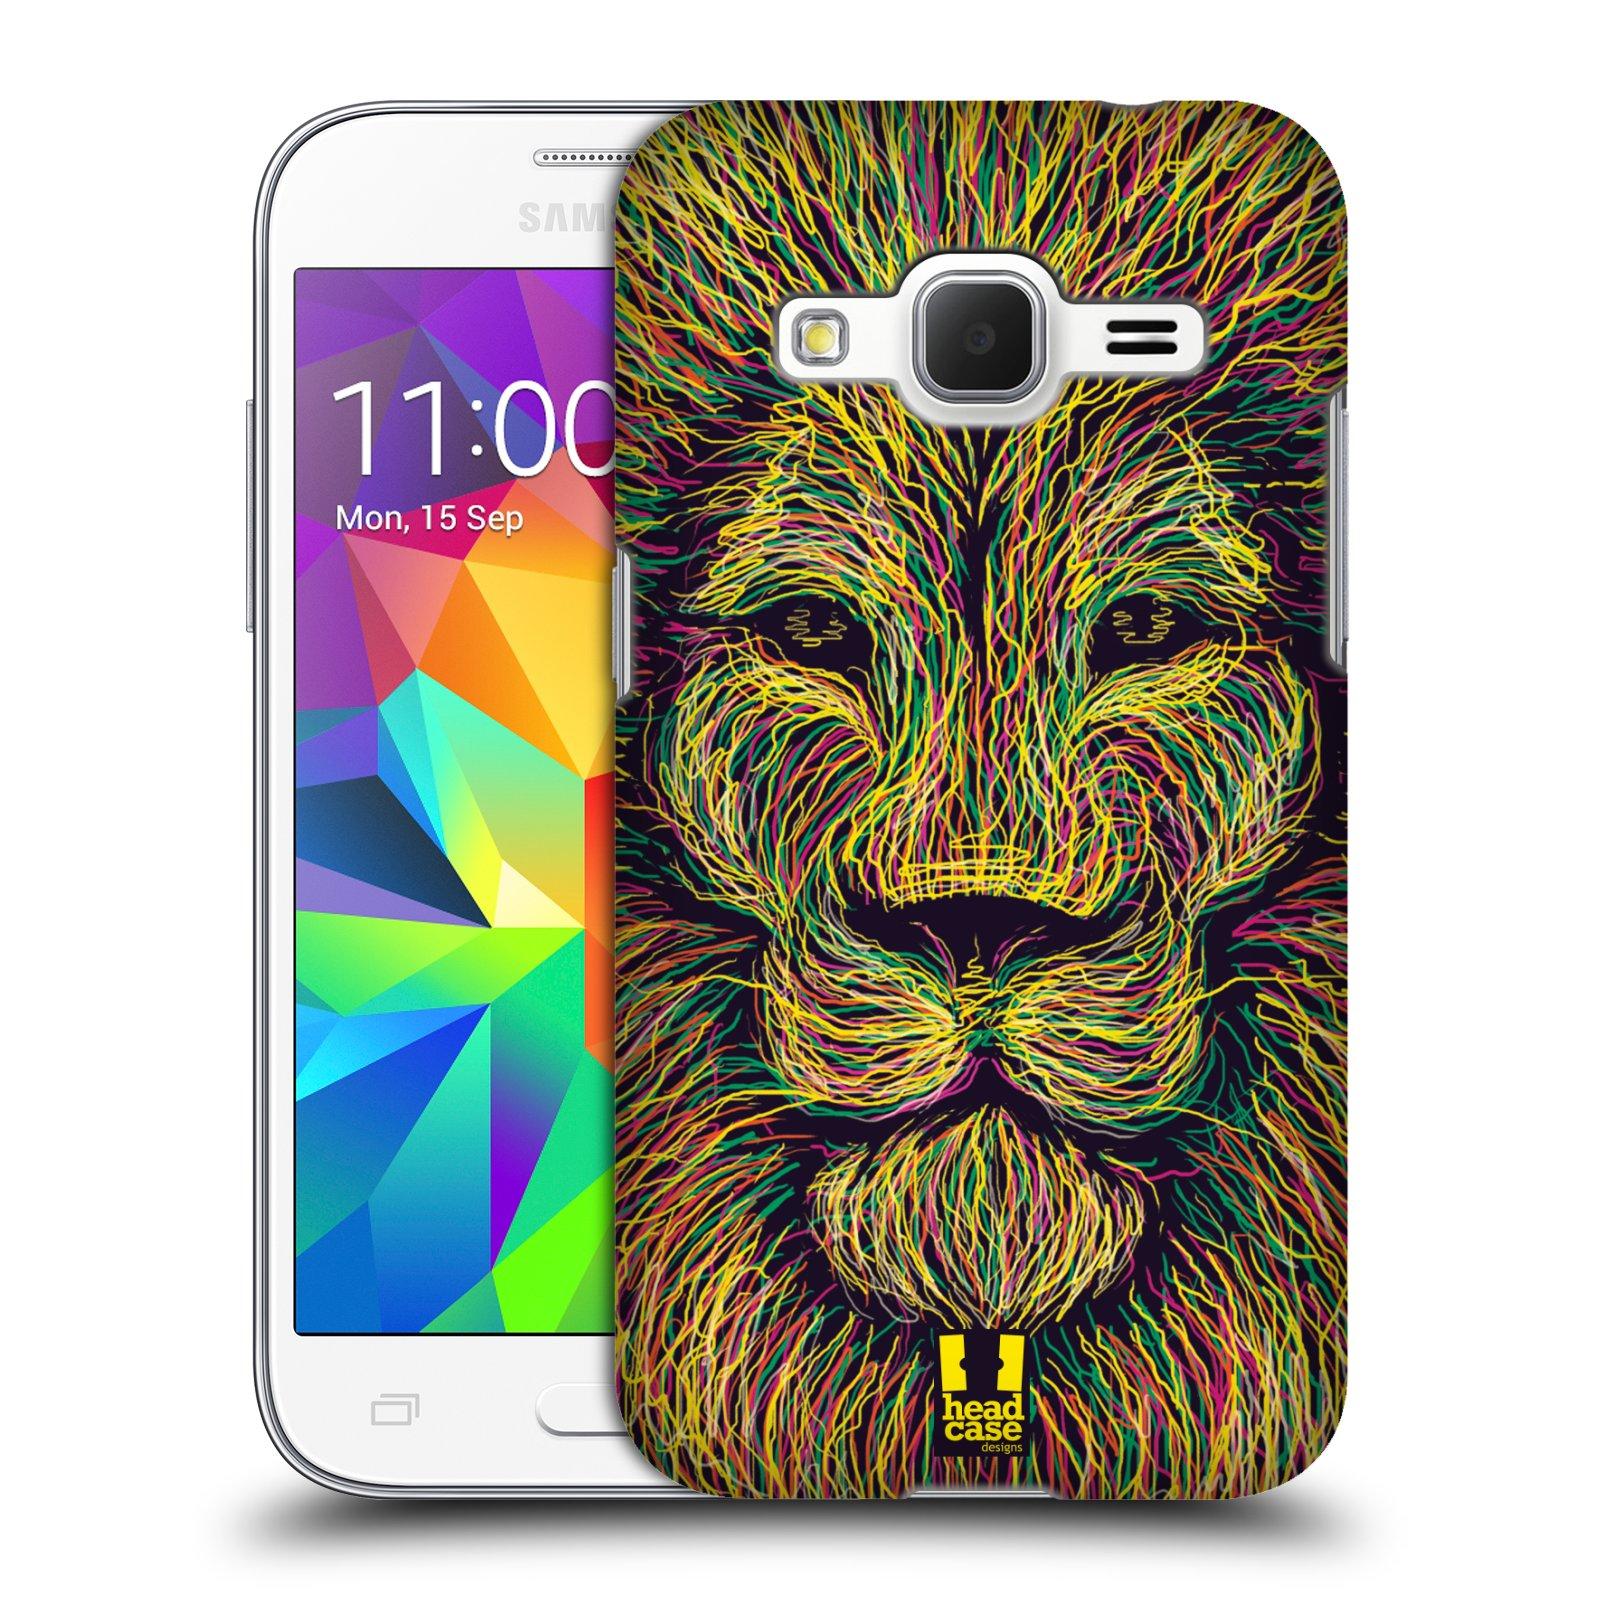 HEAD CASE plastový obal na mobil SAMSUNG GALAXY Core Prime (Core Prime VE) vzor zvíře čmáranice lev